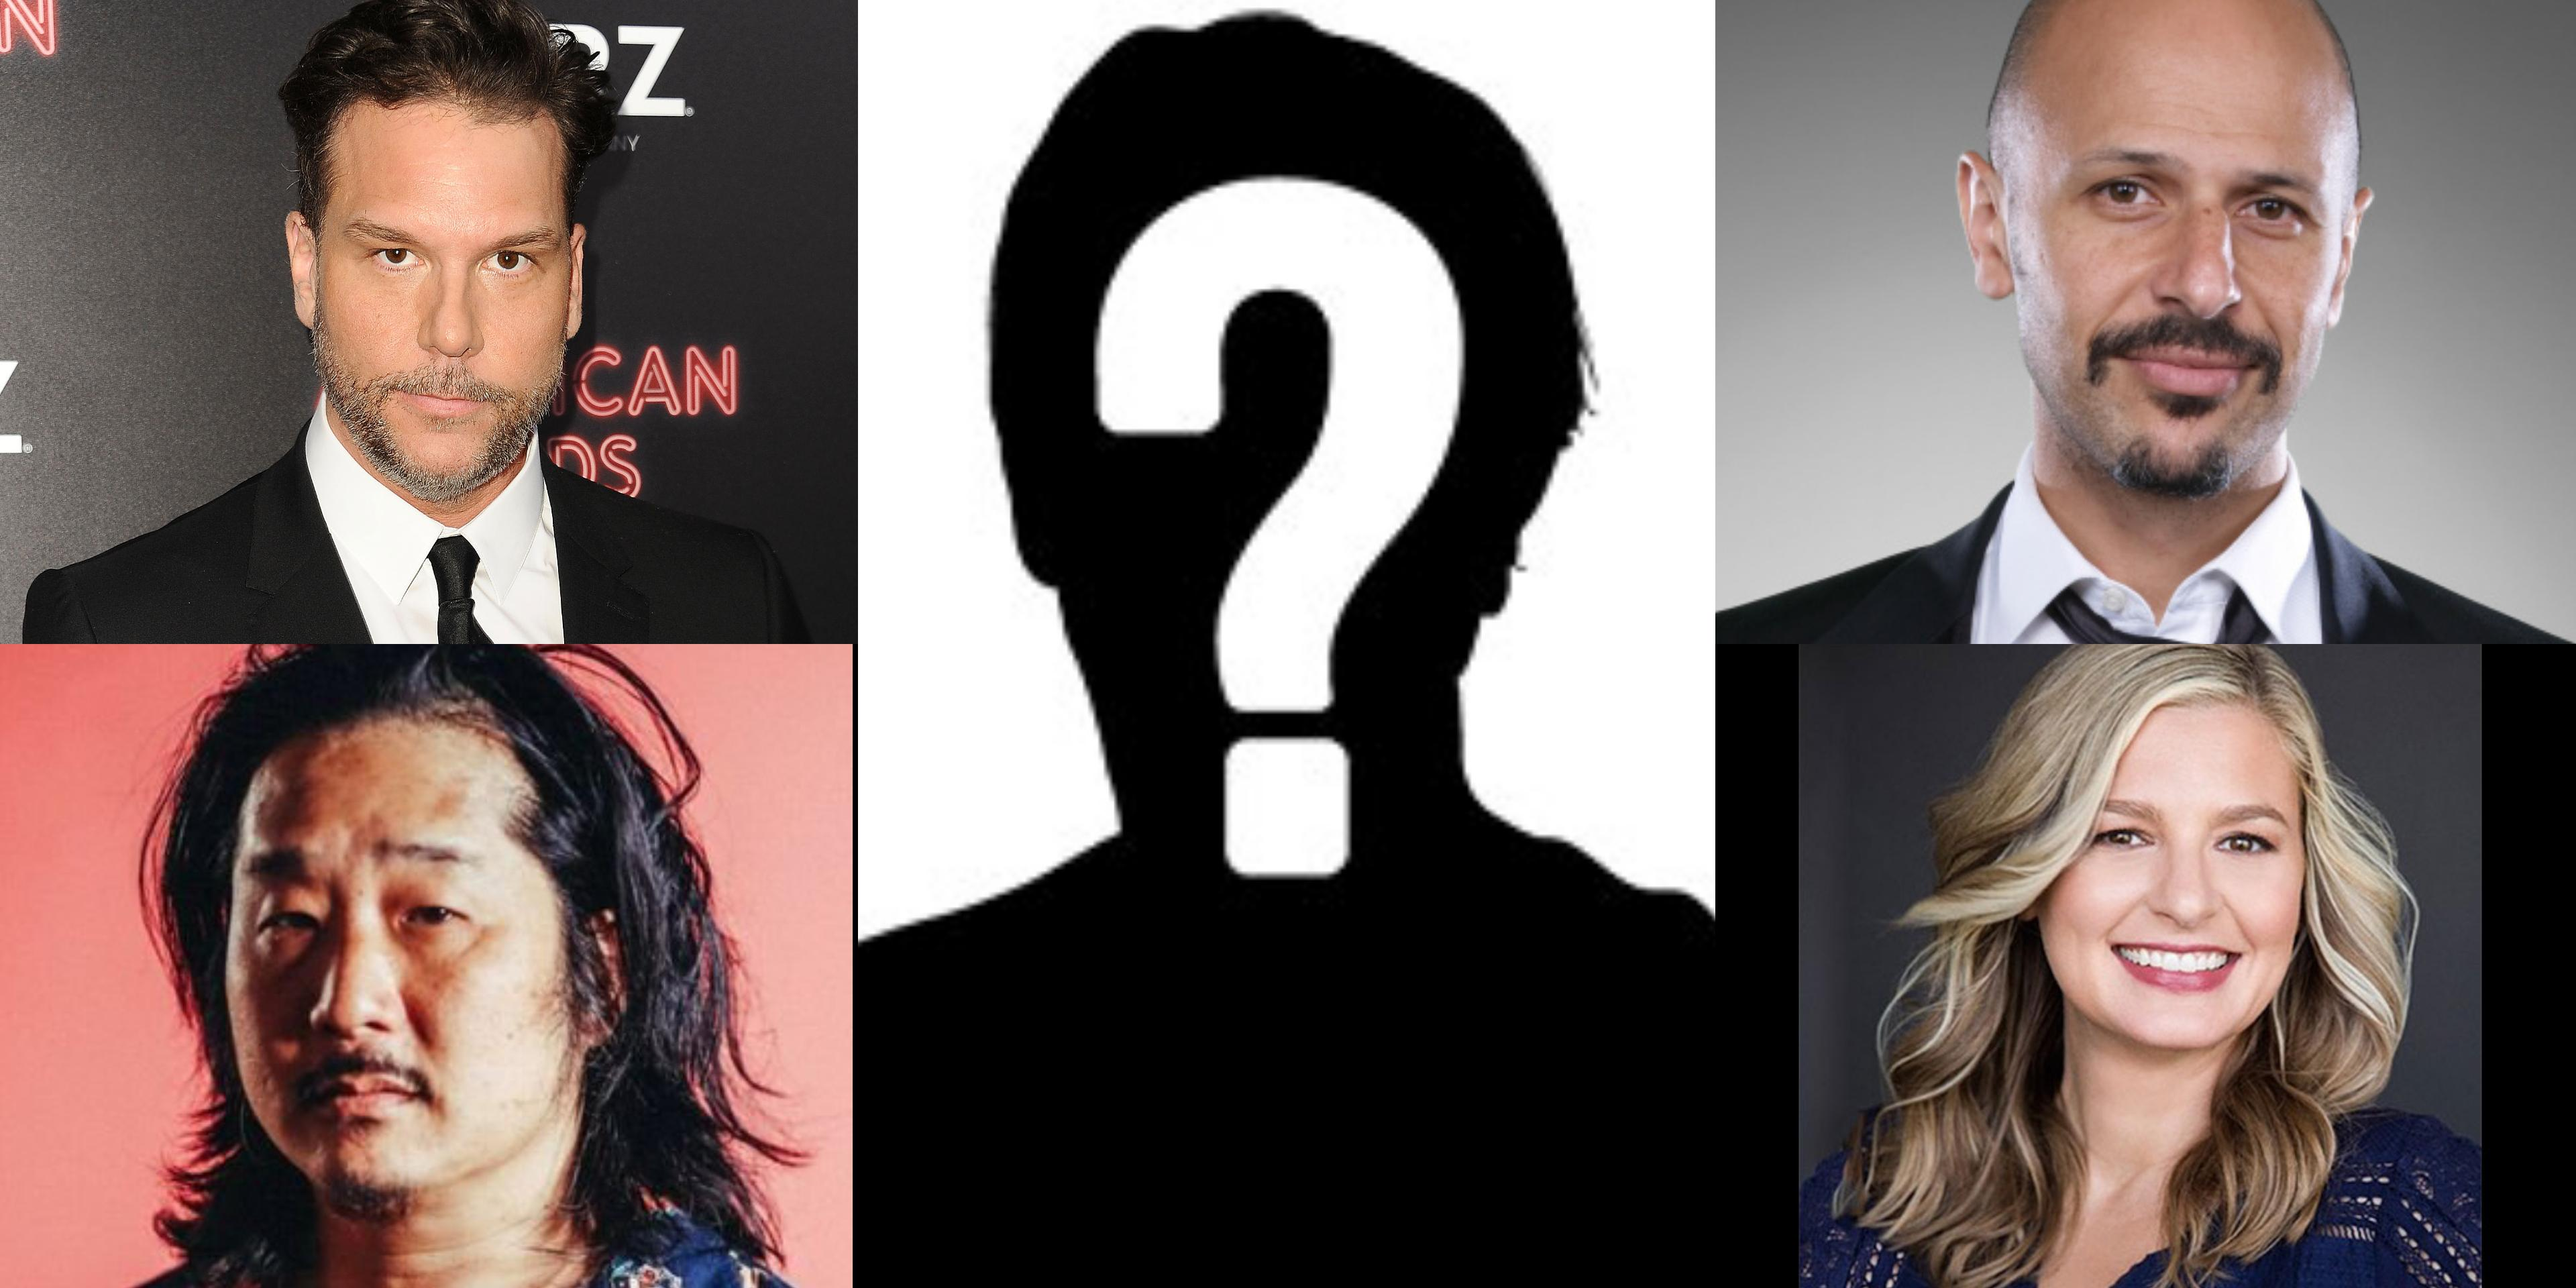 Dane Cook, Maz Jobrani, Christina P., Bobby Lee, + A HUGE SURPRISE GUEST!